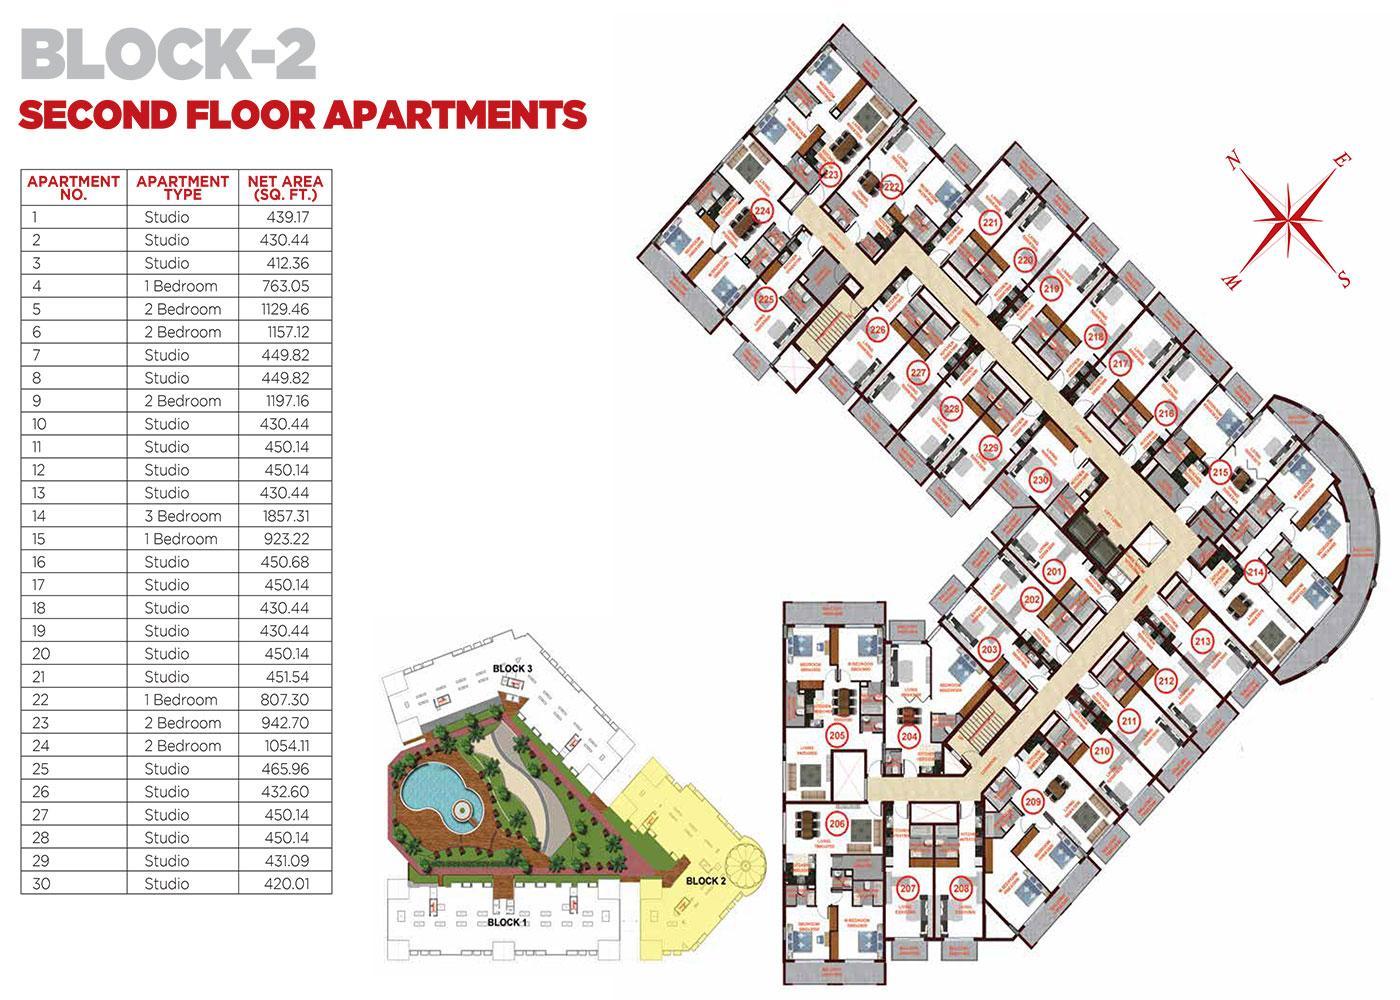 Second Floor Apartments Block 2